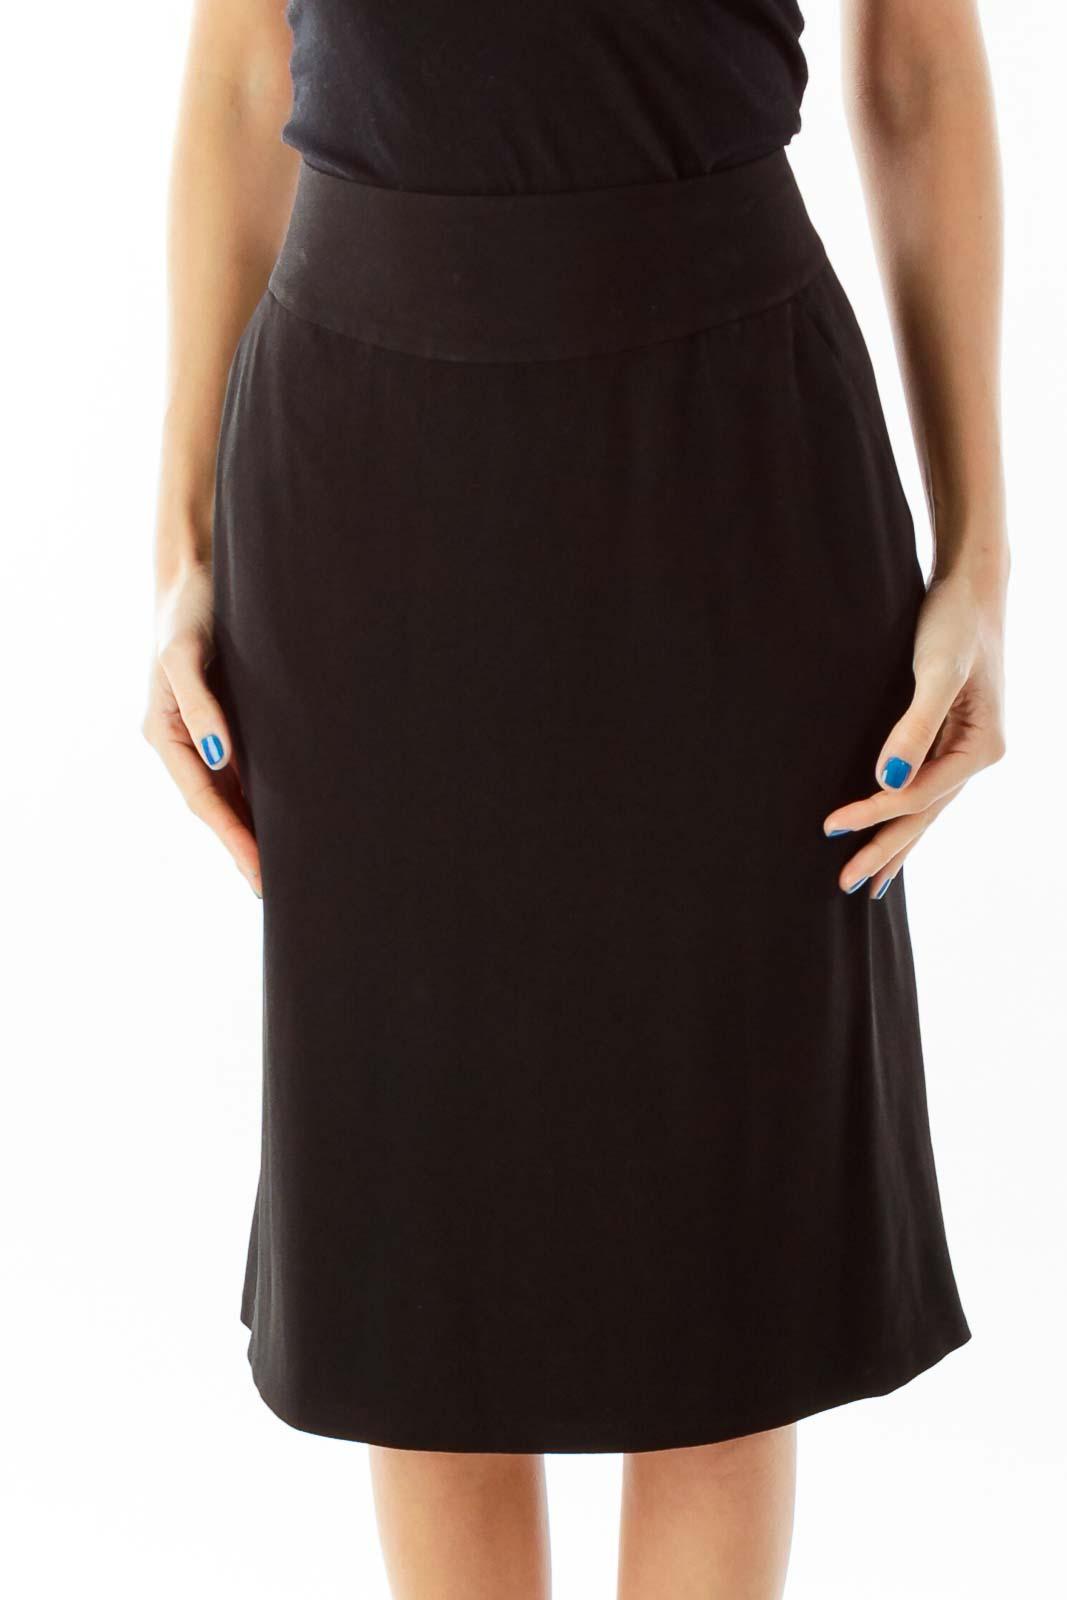 Black Pencil Midi Skirt Front